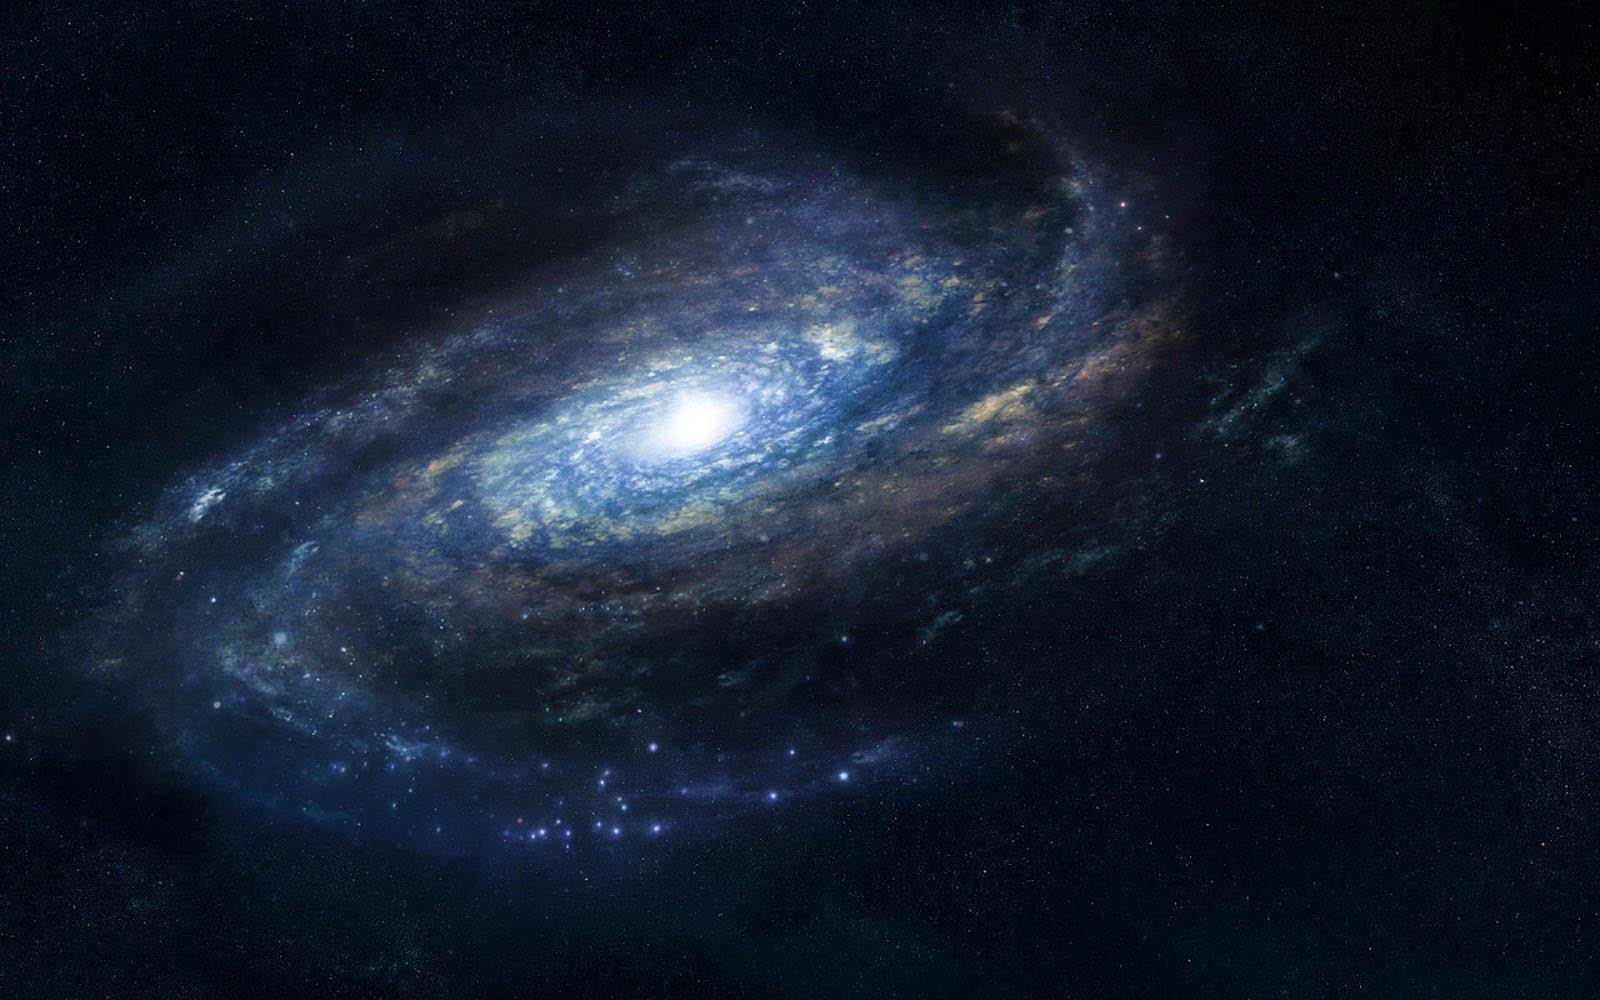 galaxy wallpapers galaxy desktop wallpapers galaxy desktop backgrounds 1600x1000